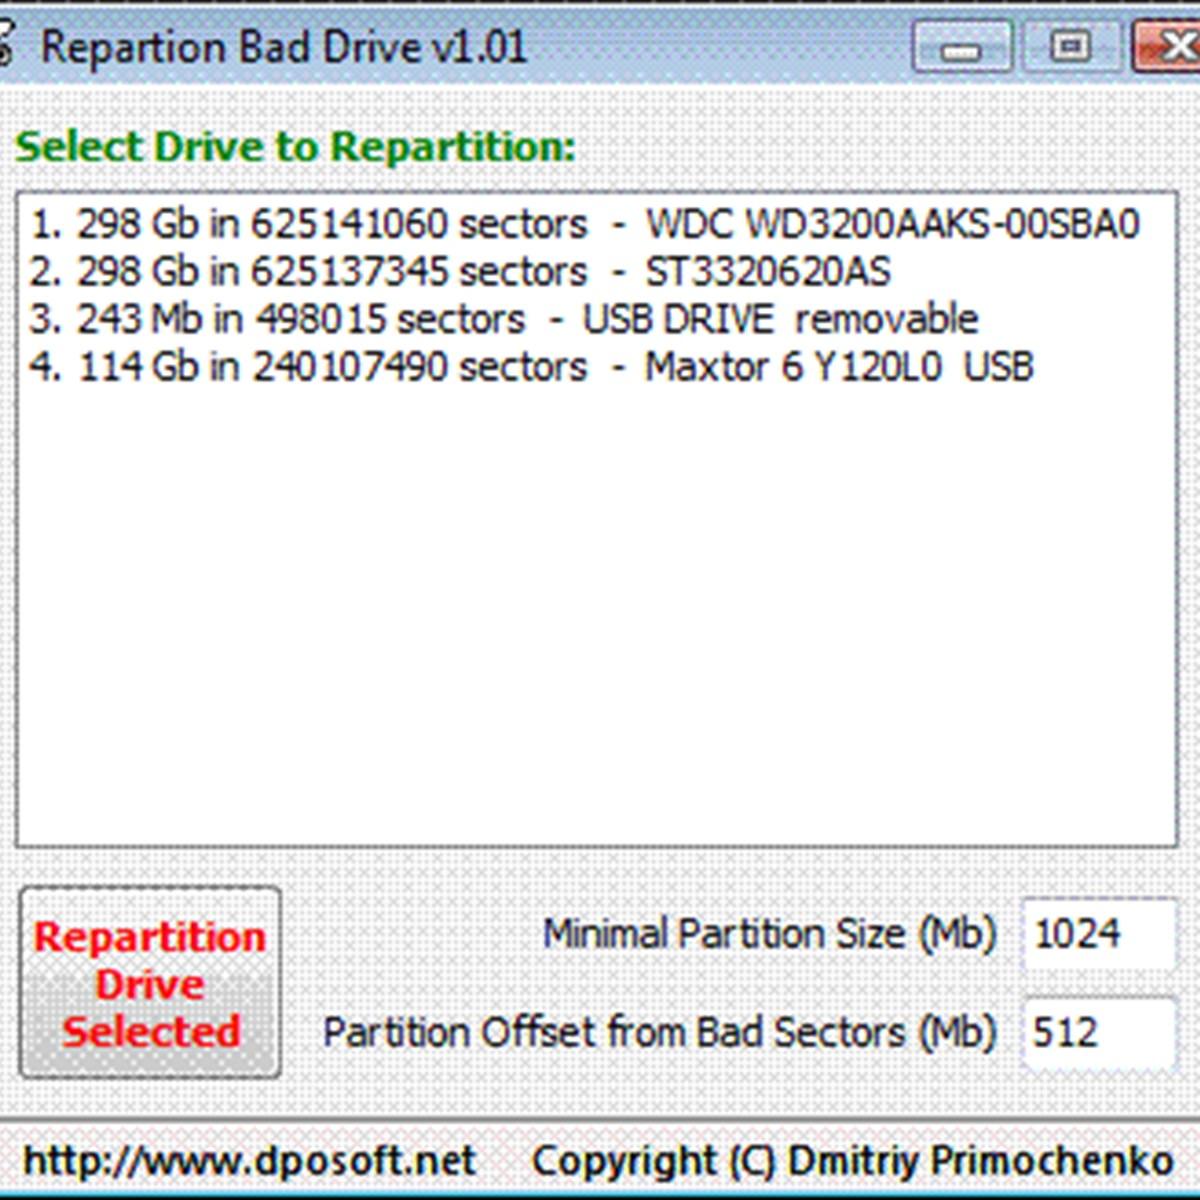 Repartition Bad Drive